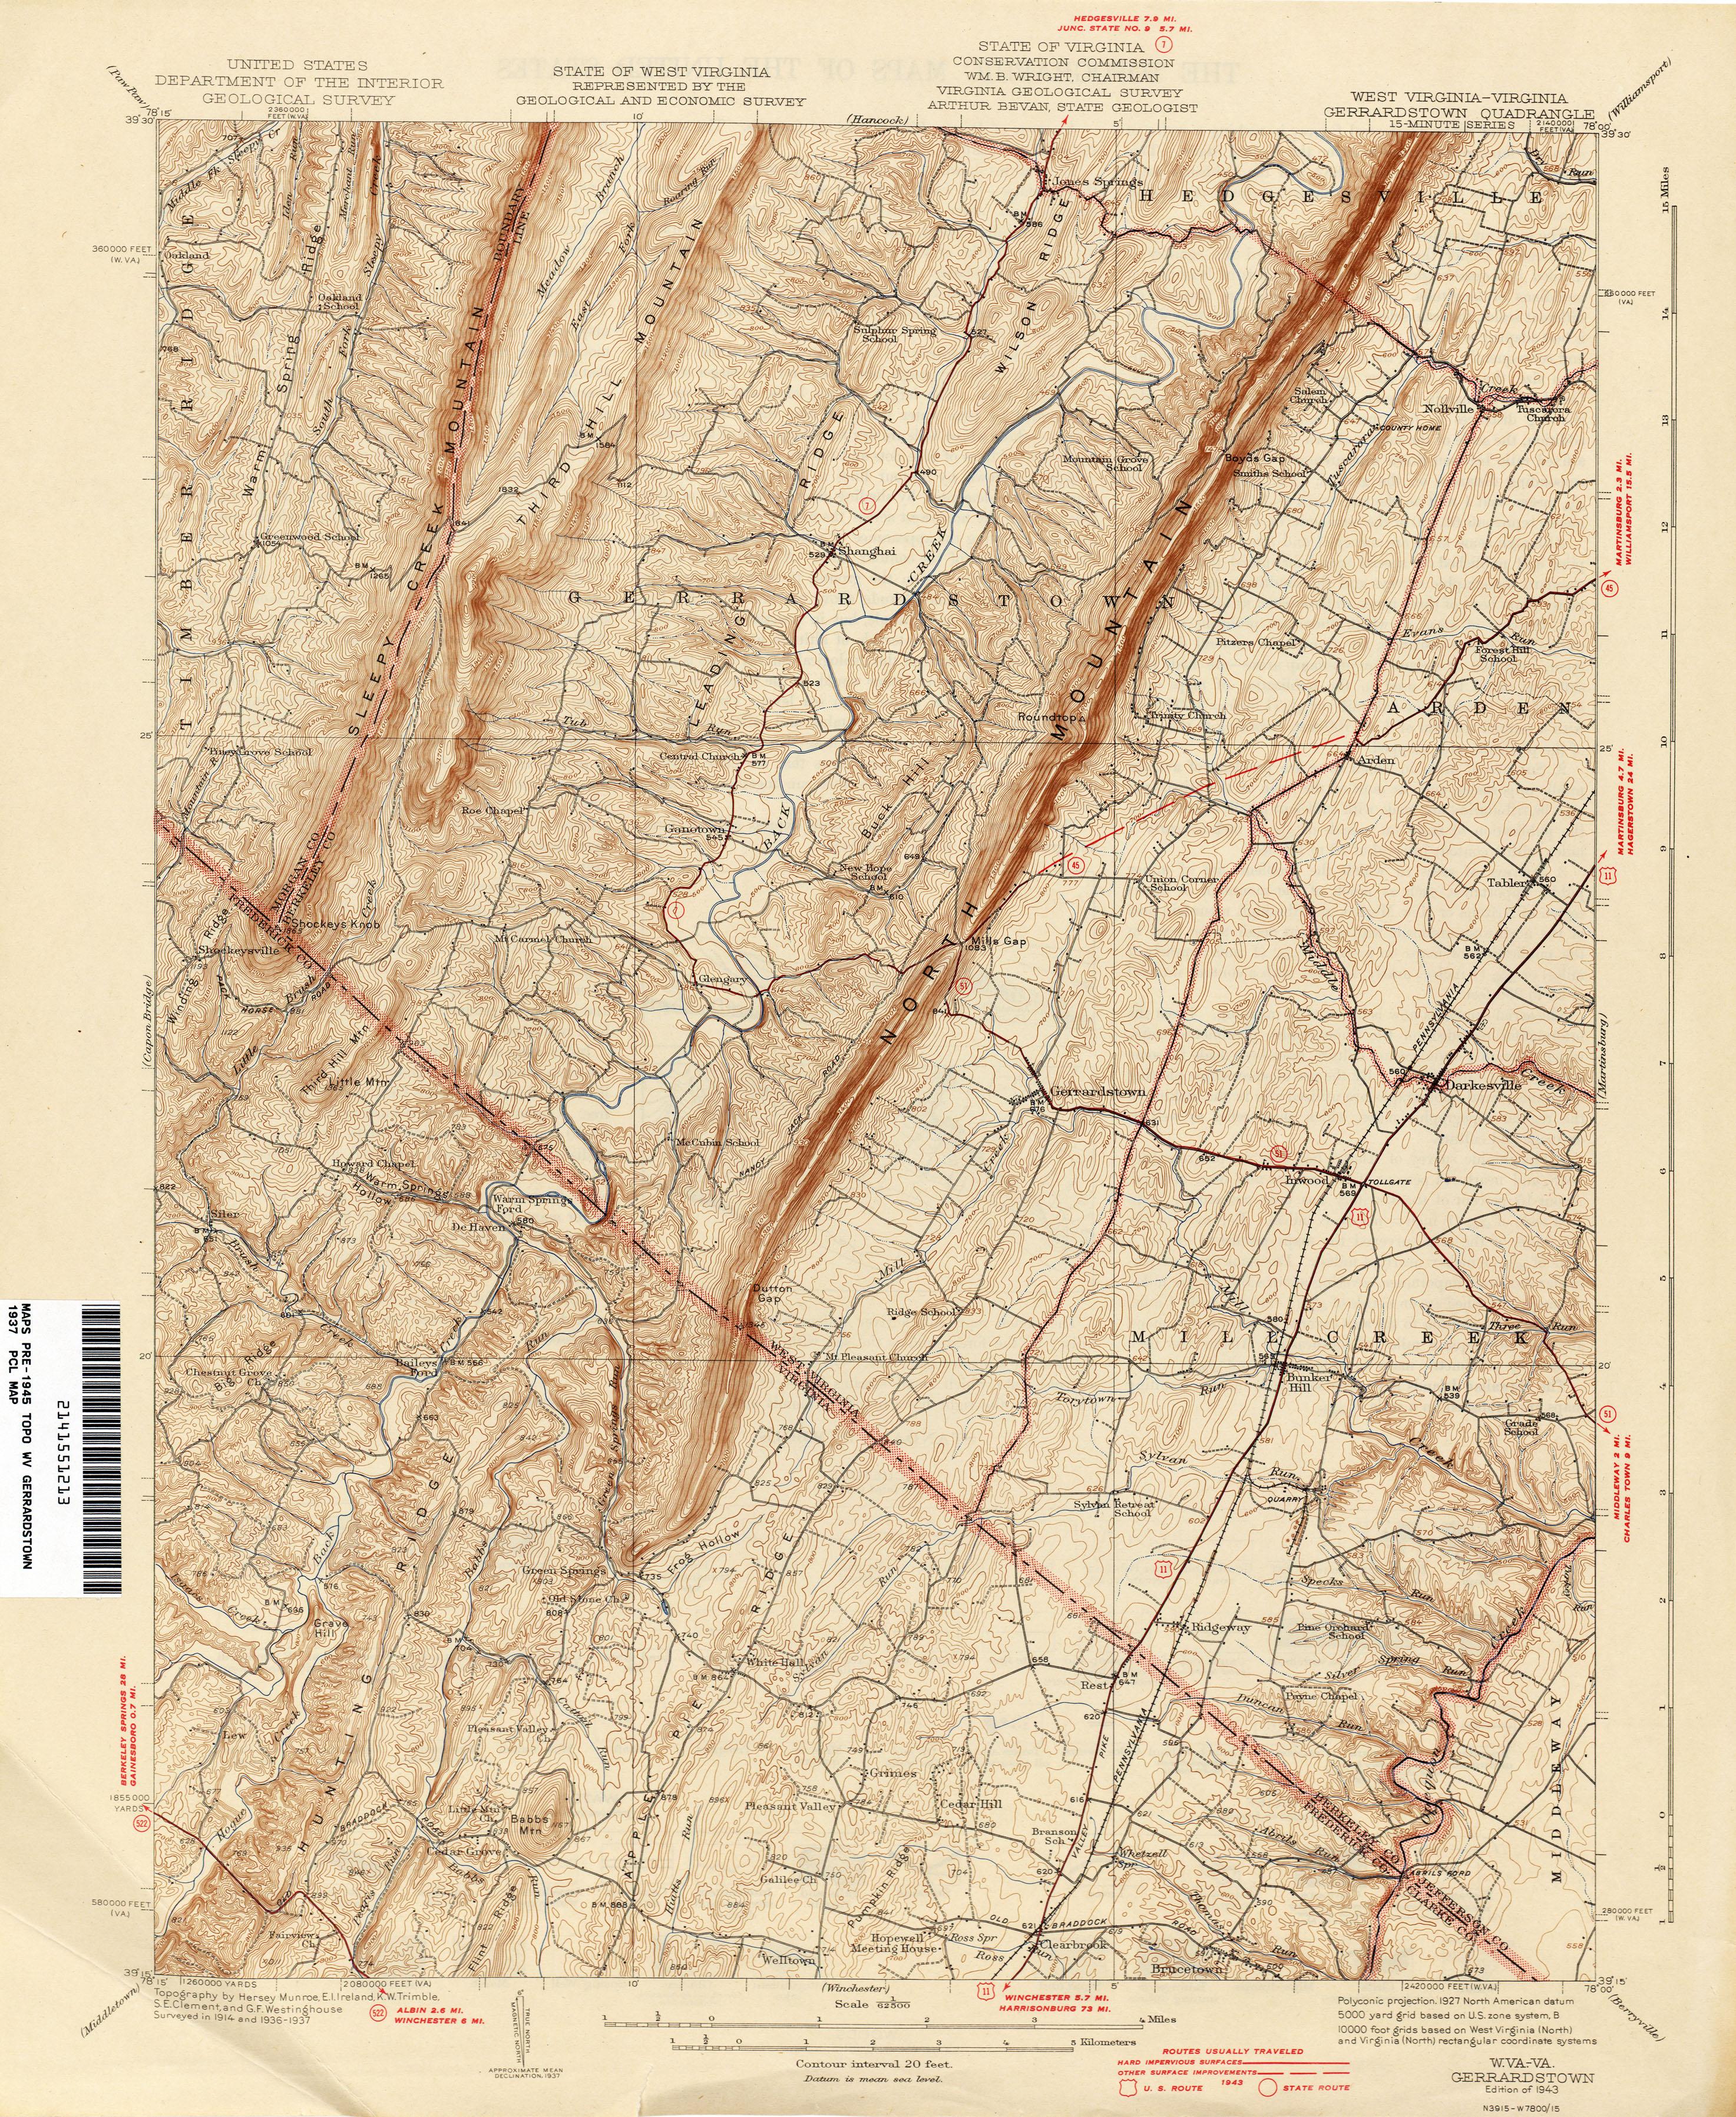 Virginia Historical Topographic Maps - Perry-Castañeda Map ... on bandy va map, kents store va map, weyers cave va map, dyke va map, charles town va map, new york va map, steeles tavern va map, spotsylvania courthouse va map, paris va on map, stanleytown va map, the plains va map, rappahannock river va map, baileys crossroads va map, stanley va map, va state highway map, cana va map, clarke county va map, jefferson va map, claremont va map, birchleaf va map,